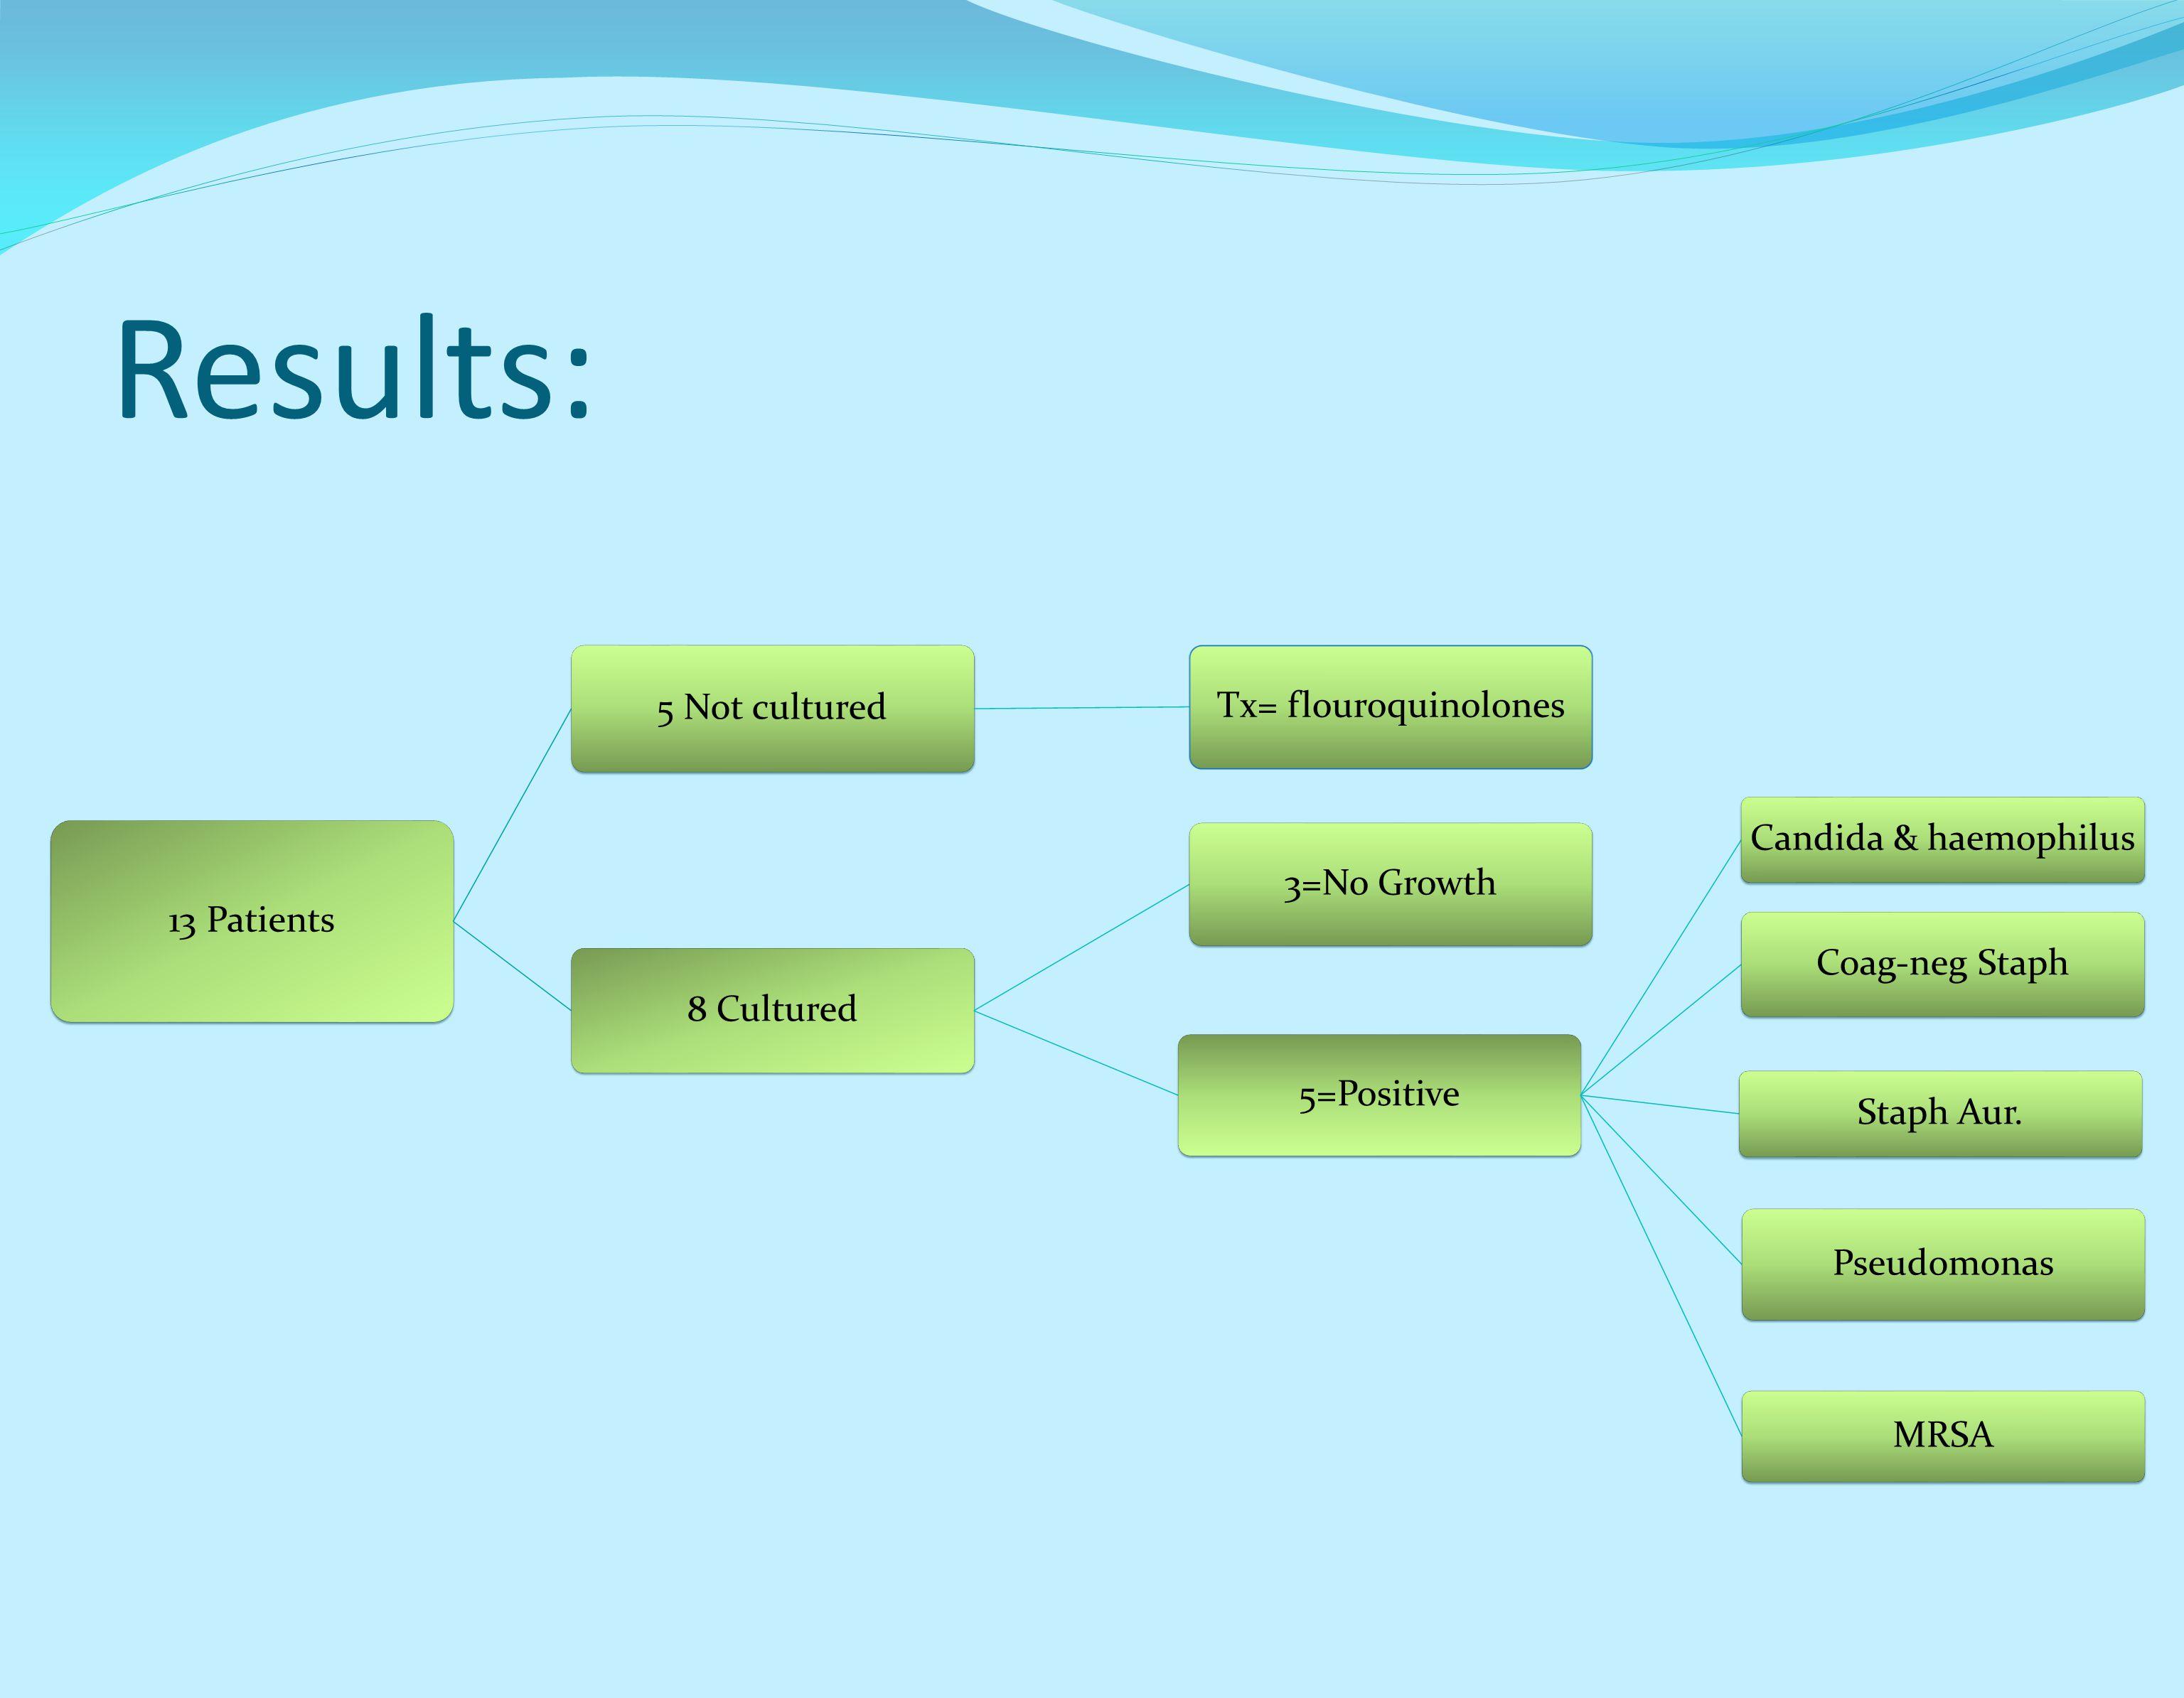 Results: 13 Patients 5 Not cultured Tx= flouroquinolones 8 Cultured 3=No Growth 5=Positive Candida & haemophilus Coag-neg Staph Staph Aur. Pseudomonas